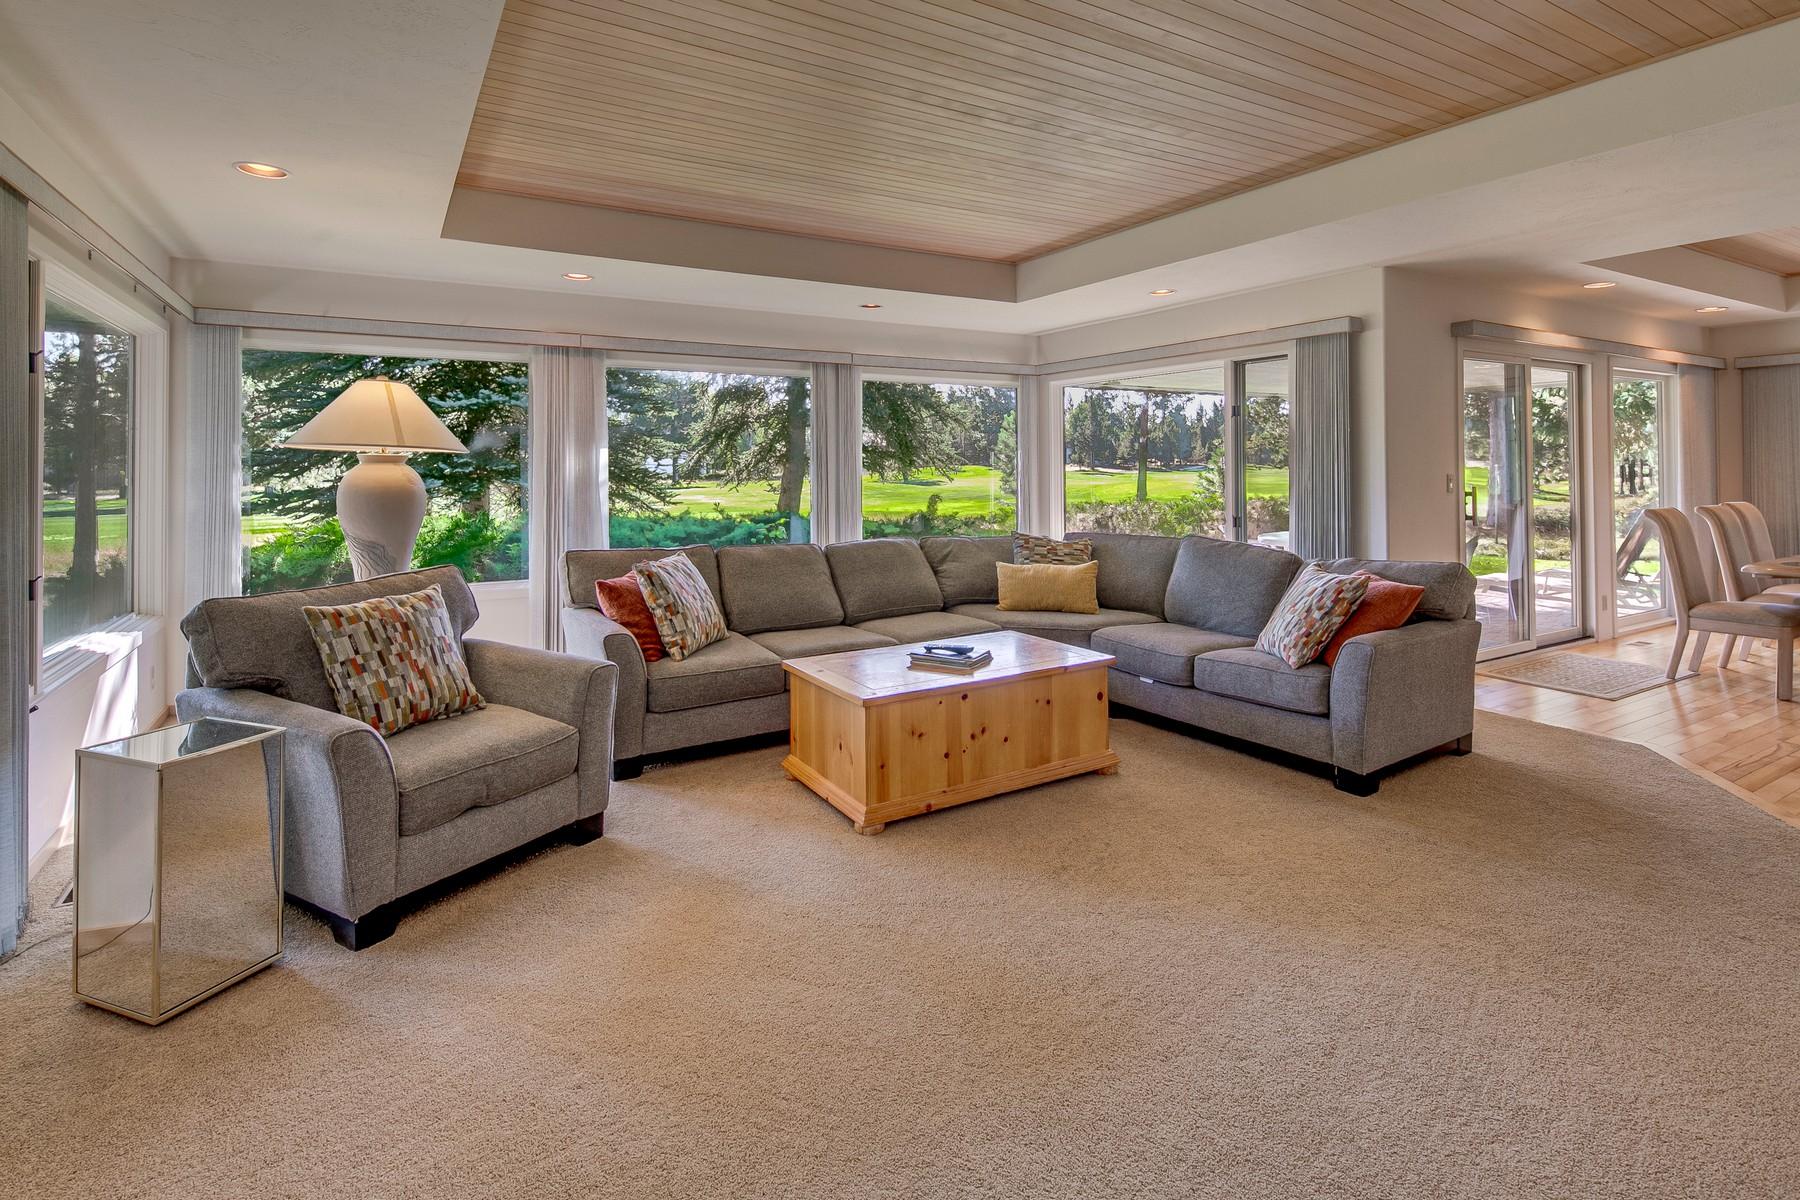 Other Residential Homes για την Πώληση στο 58068 Winners Circle 28 Sunriver, OR 97707 Sunriver, Ορεγκον 97707 Ηνωμένες Πολιτείες